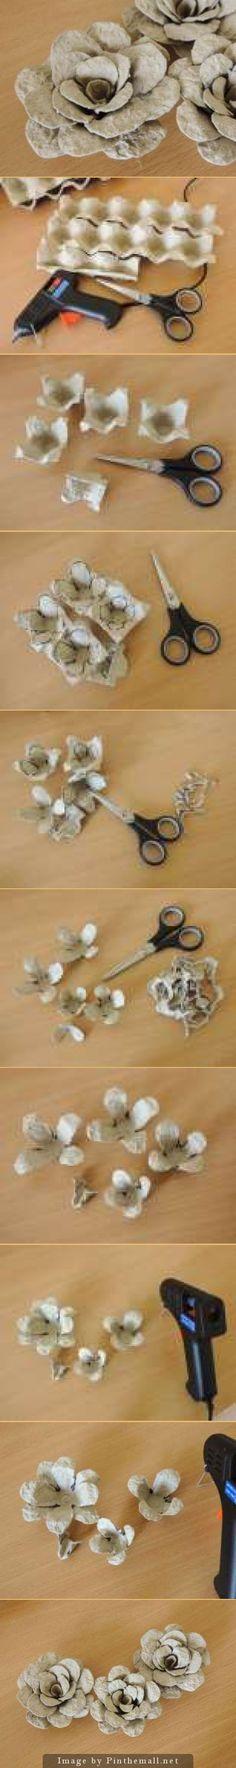 The whole detailed photo tutorial on how to make these egg carton flowers - Tutorial foto: trandafiri din cofraje de ouă | Atelierul Grădina cu fluturi